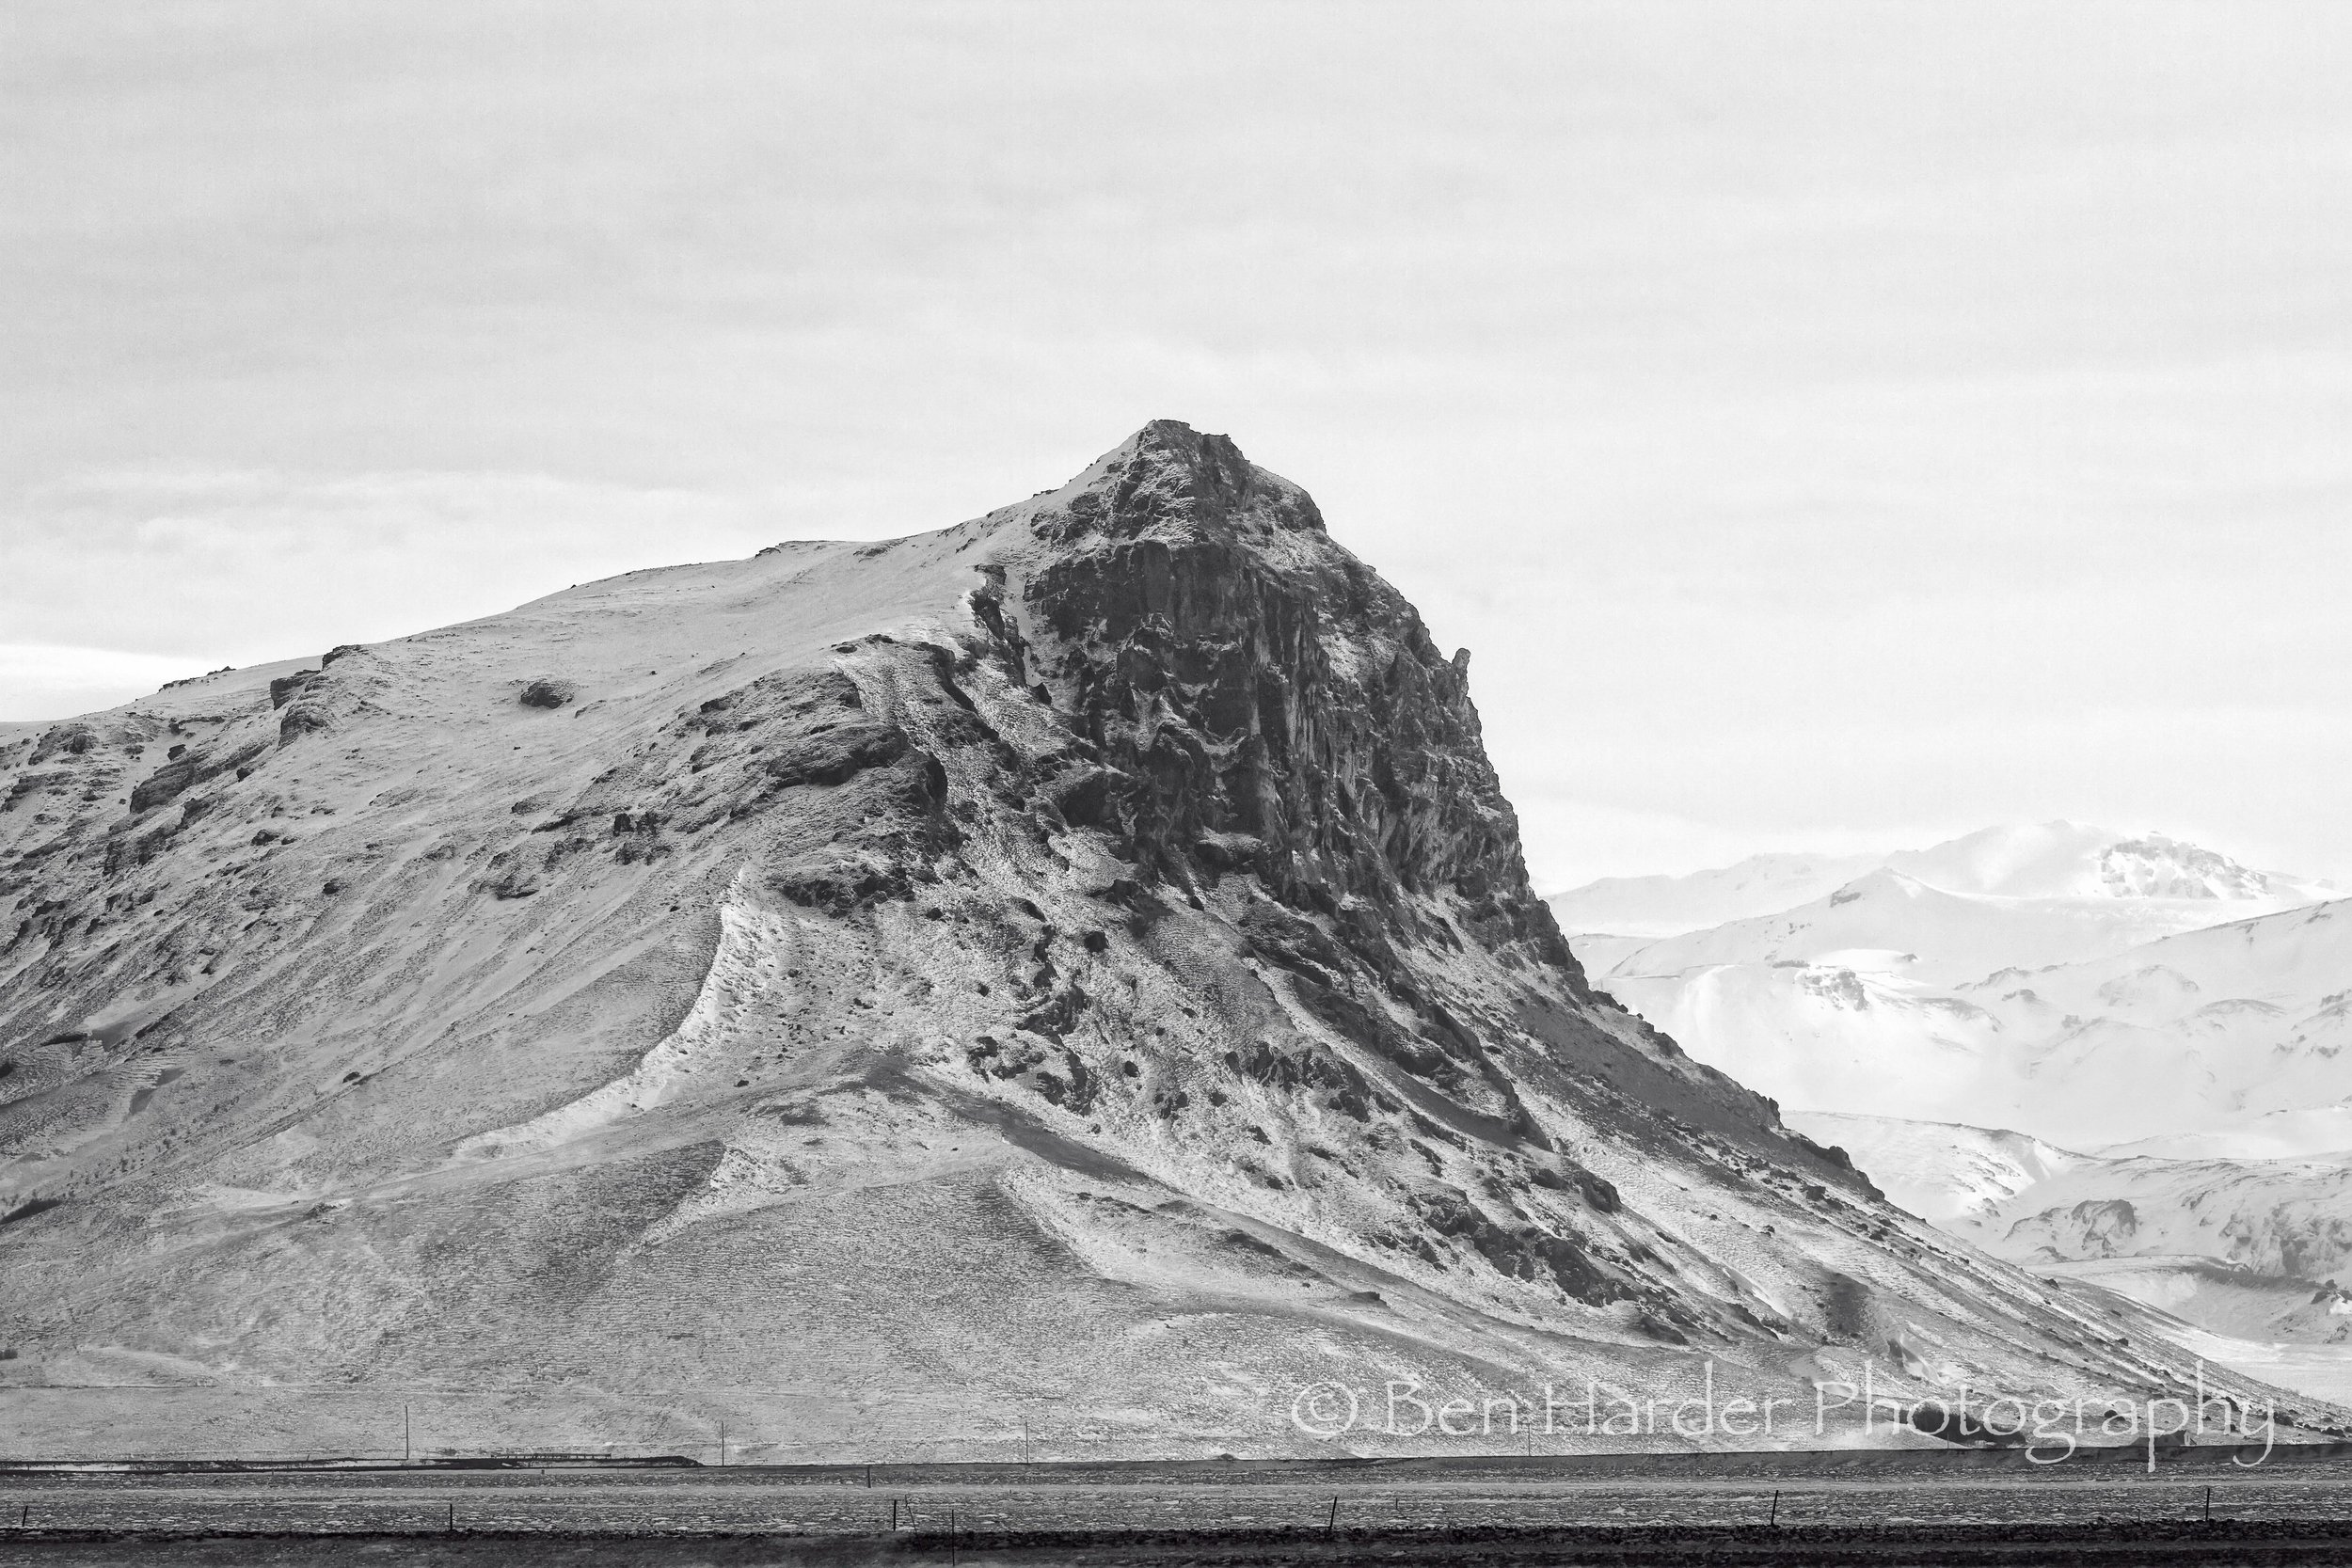 """Salt and Pepper"" - Iceland"